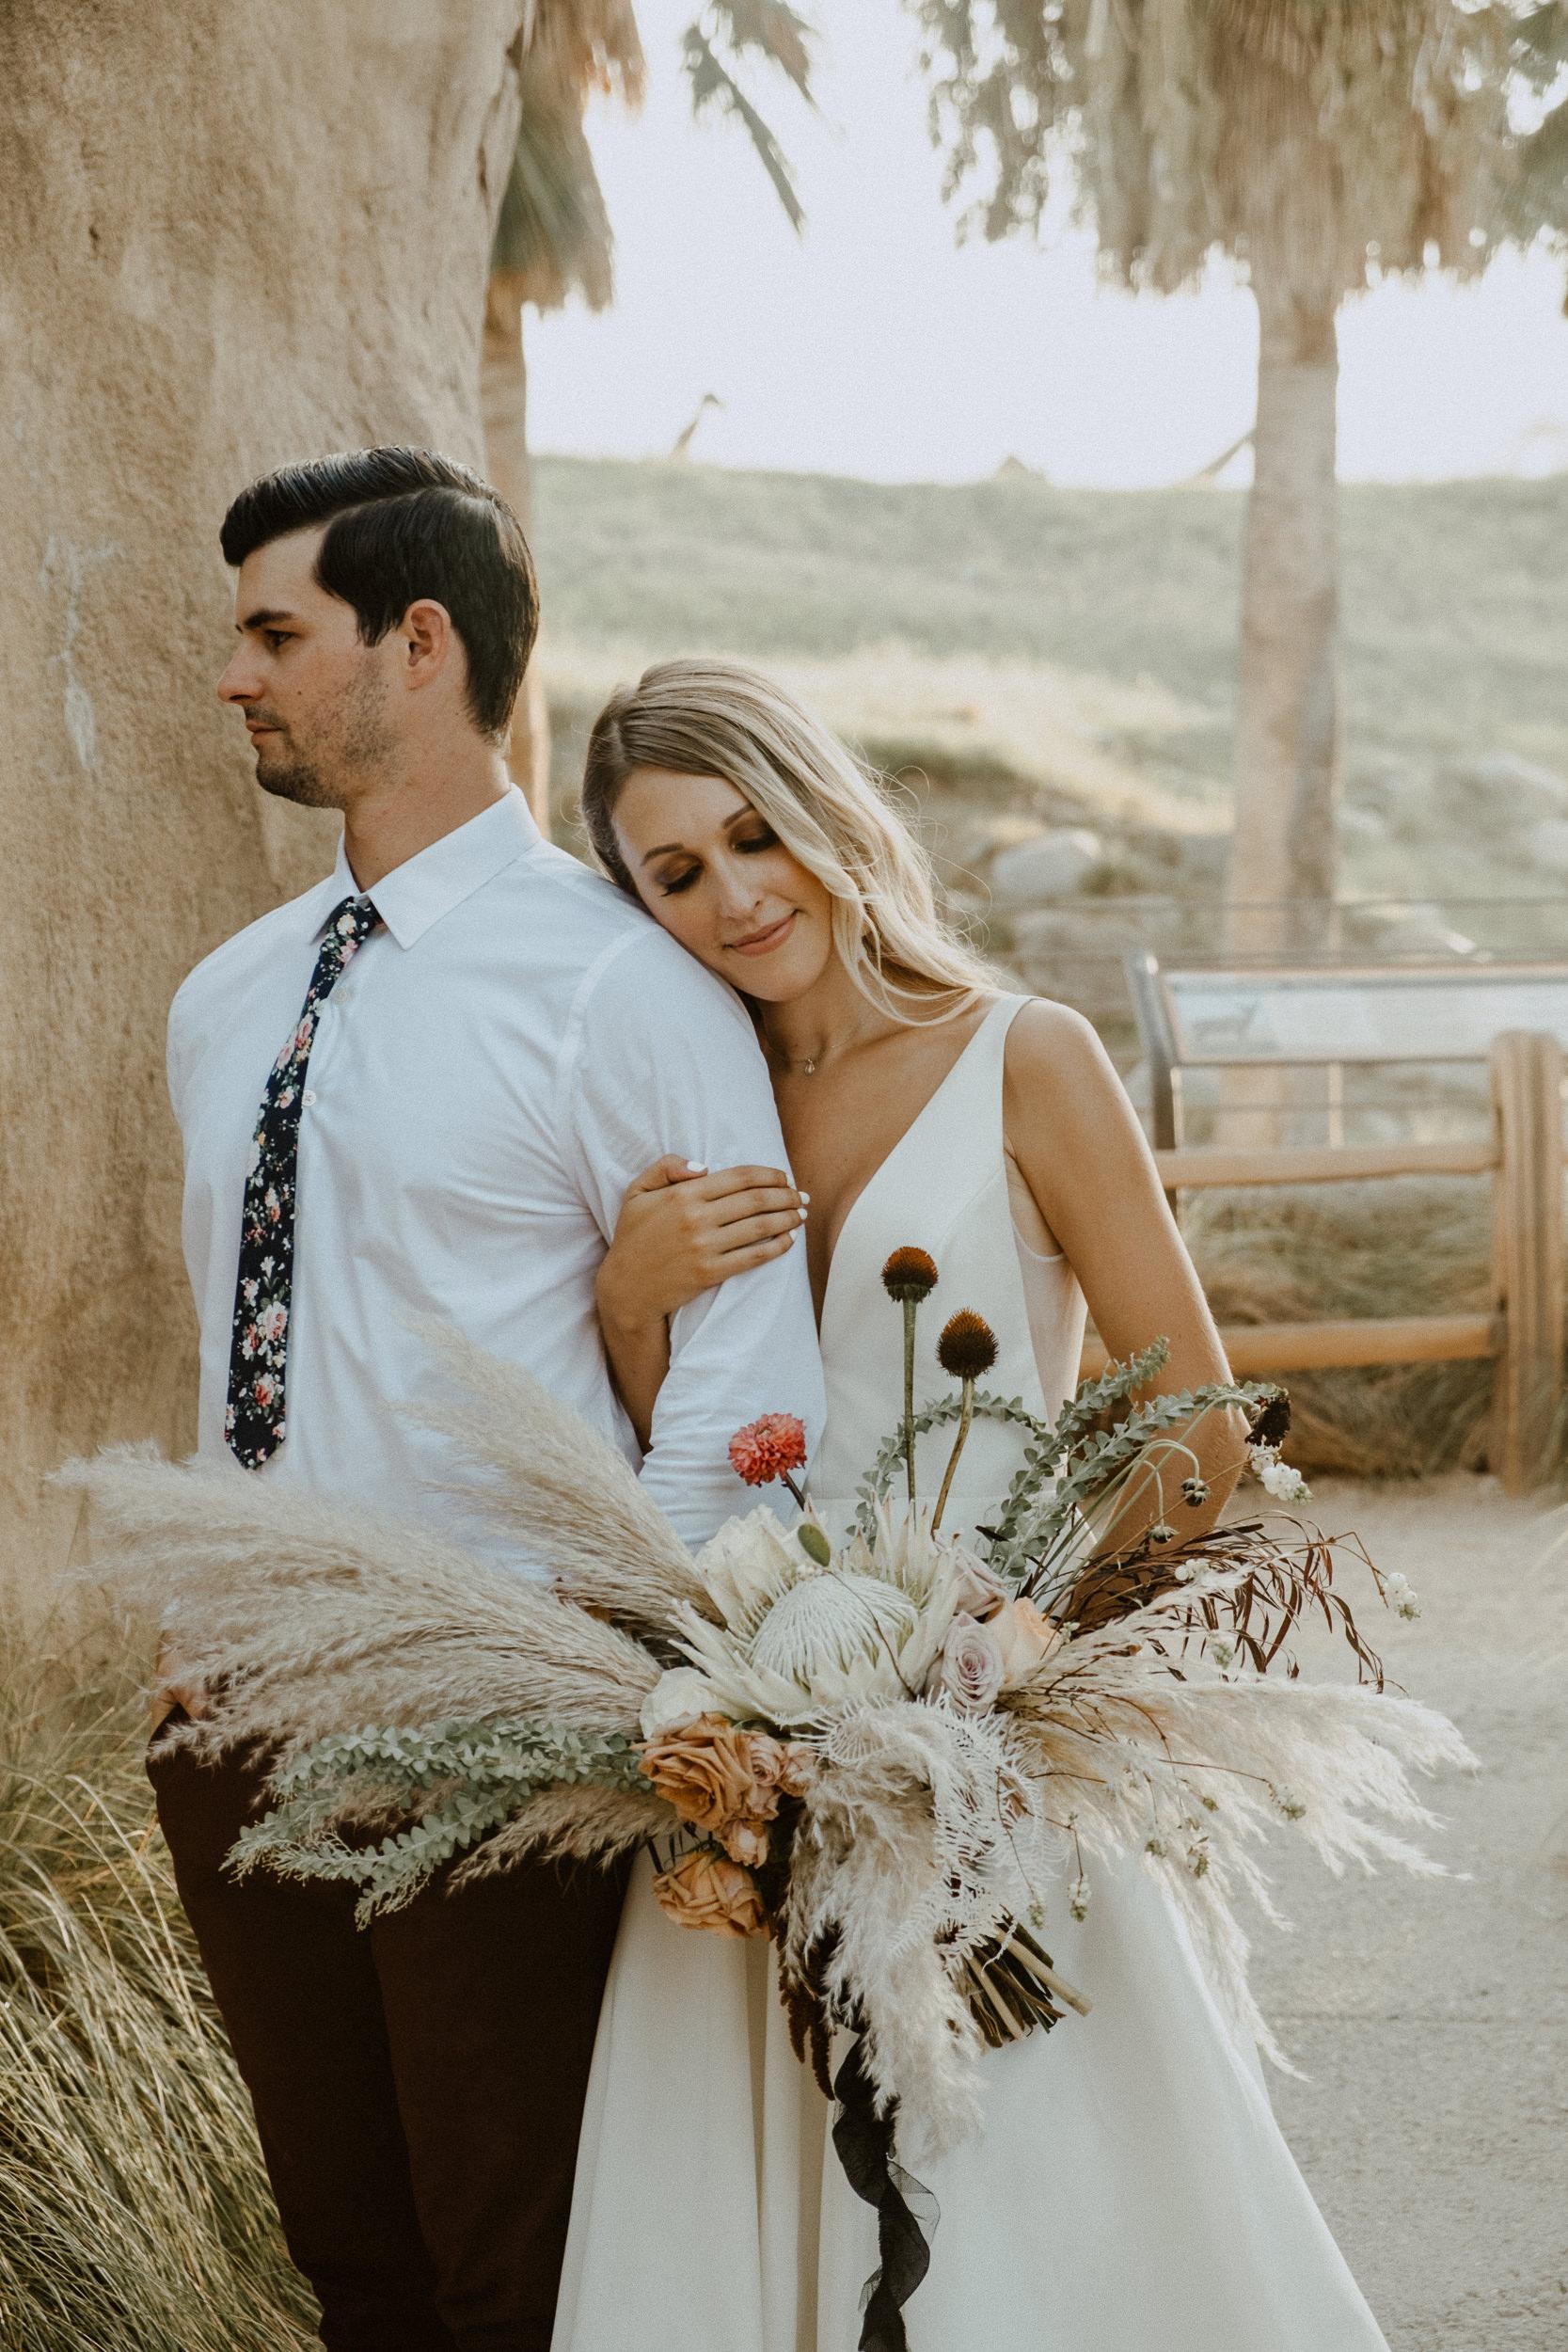 sChelsie + Chris - The Desert Shootout Wedding Romantics at The Living Desert-31.jpg